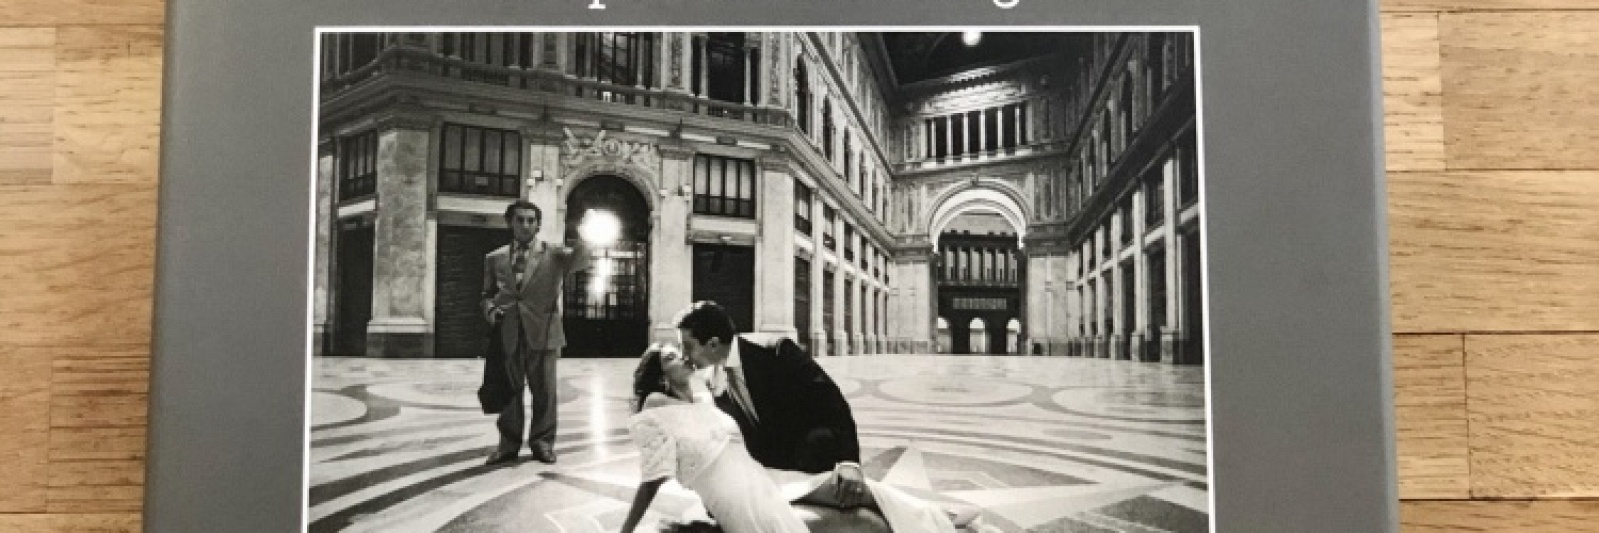 B come Book- Neapolitan wedding di Francesco Cito